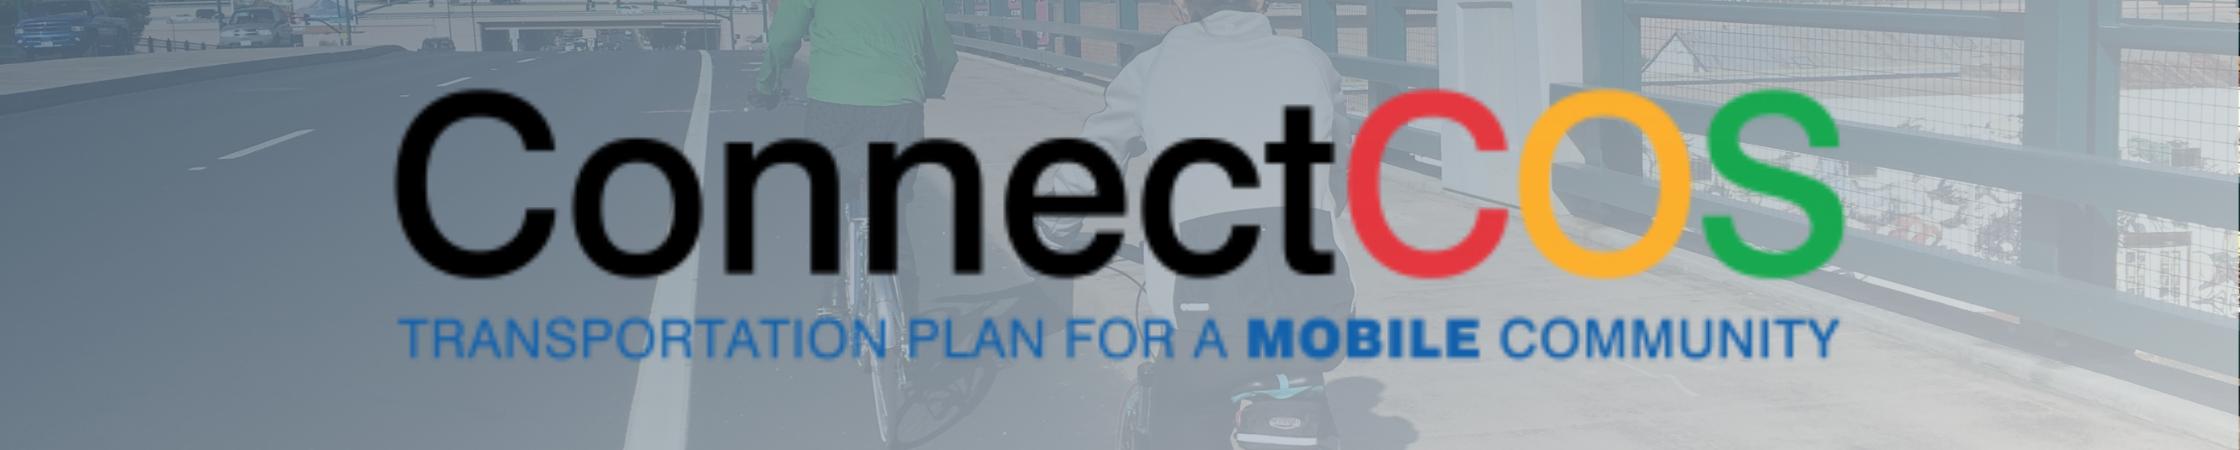 ConnectCOS – New Survey Open Now